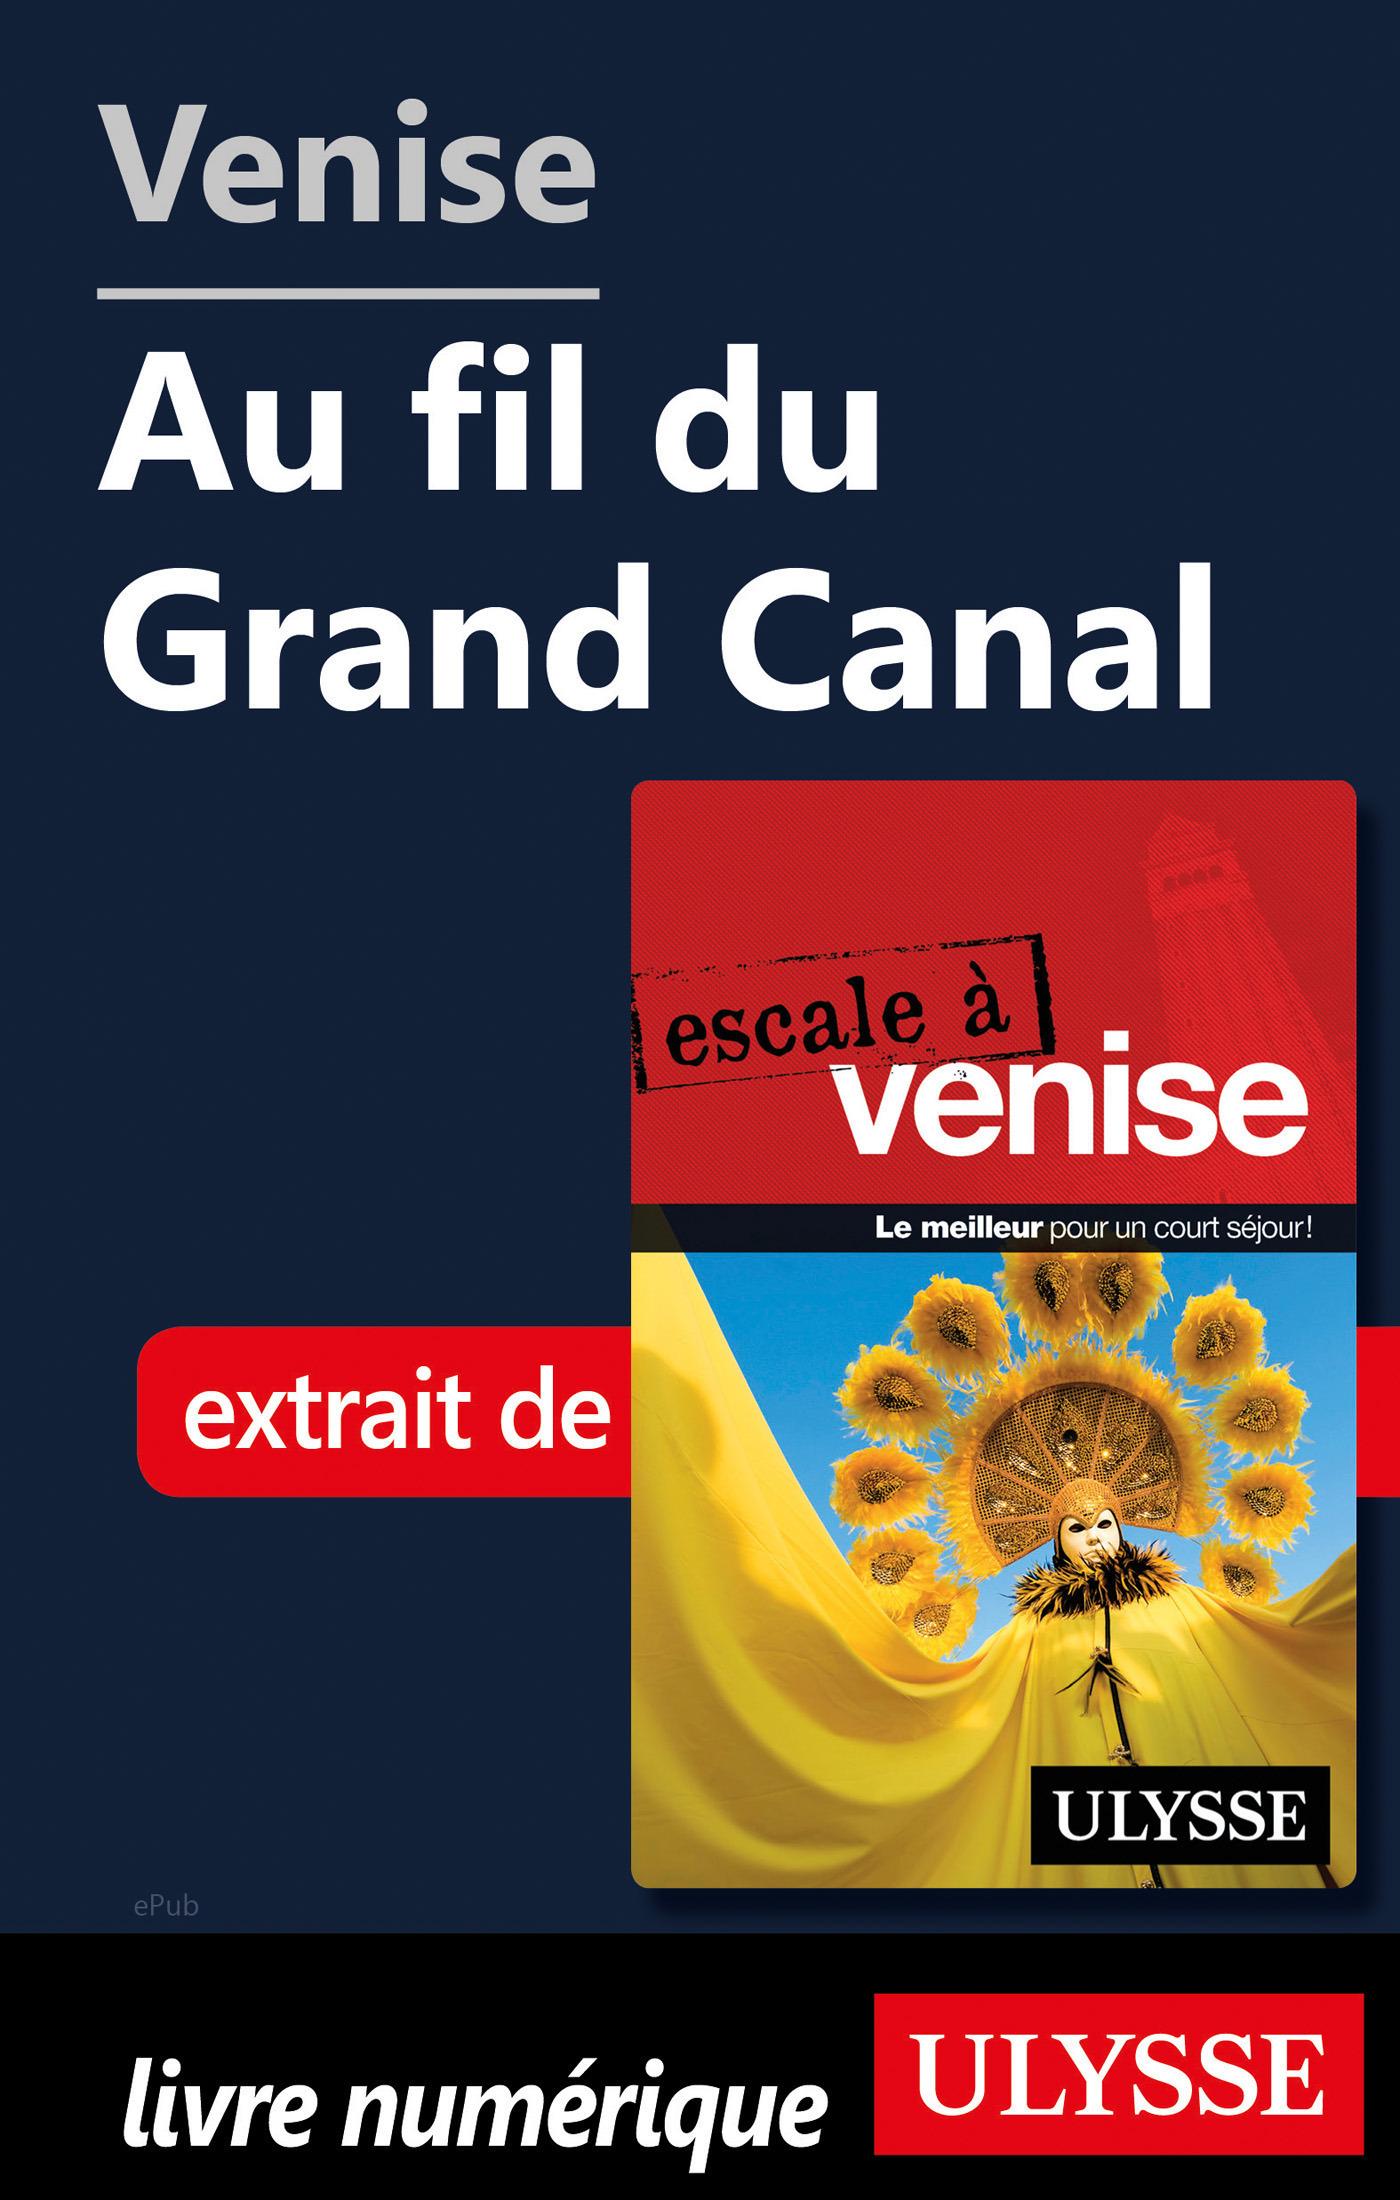 Venise - Au fil du Grand Canal